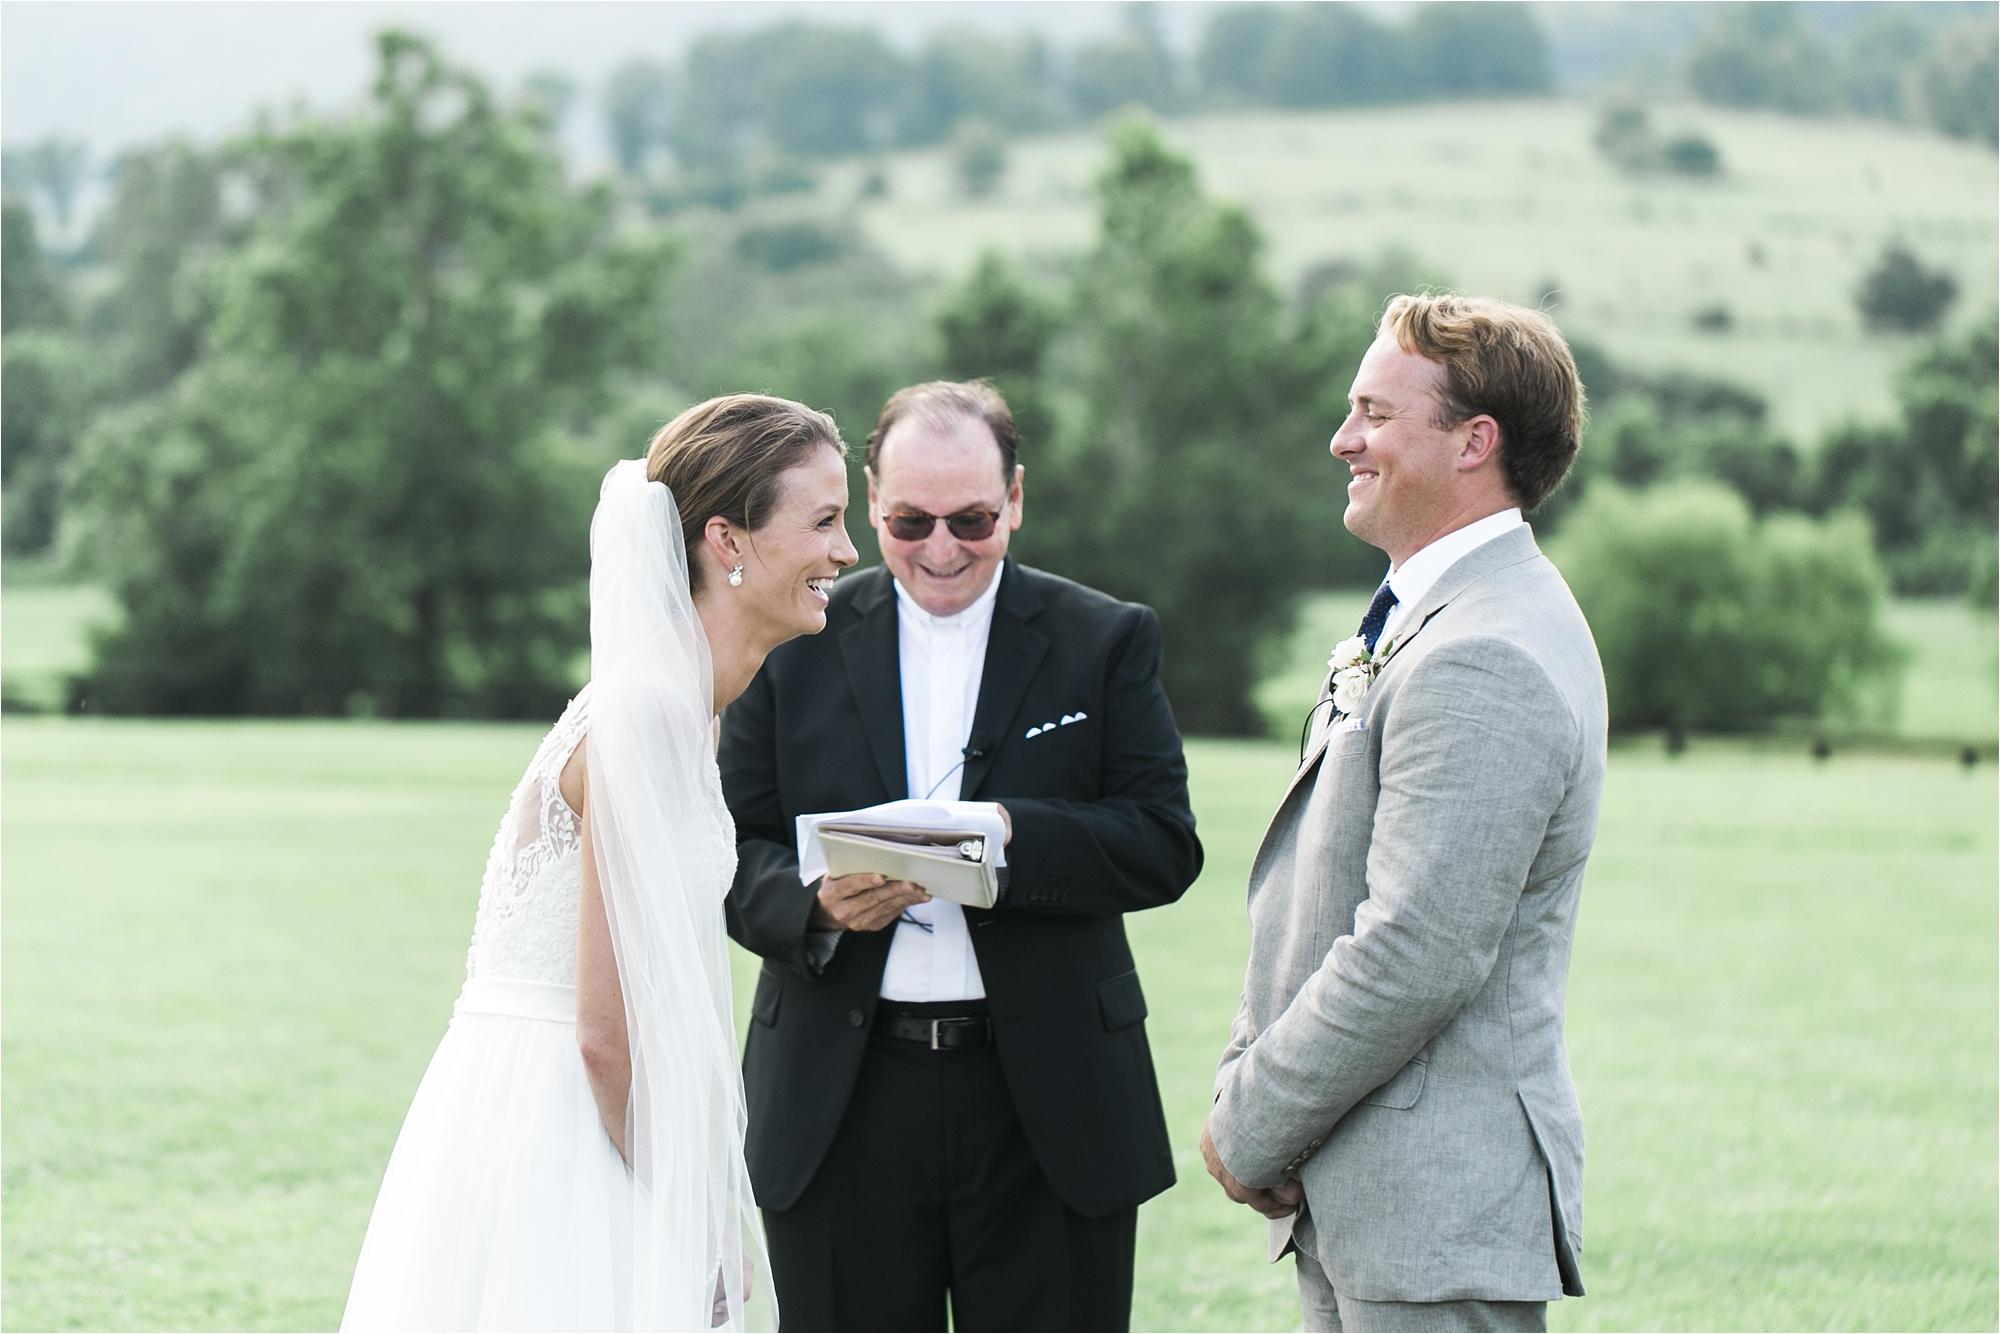 stephanie-yonce-charlottesville-virginia-king-family-vineyard-wedding-photos_0036.jpg